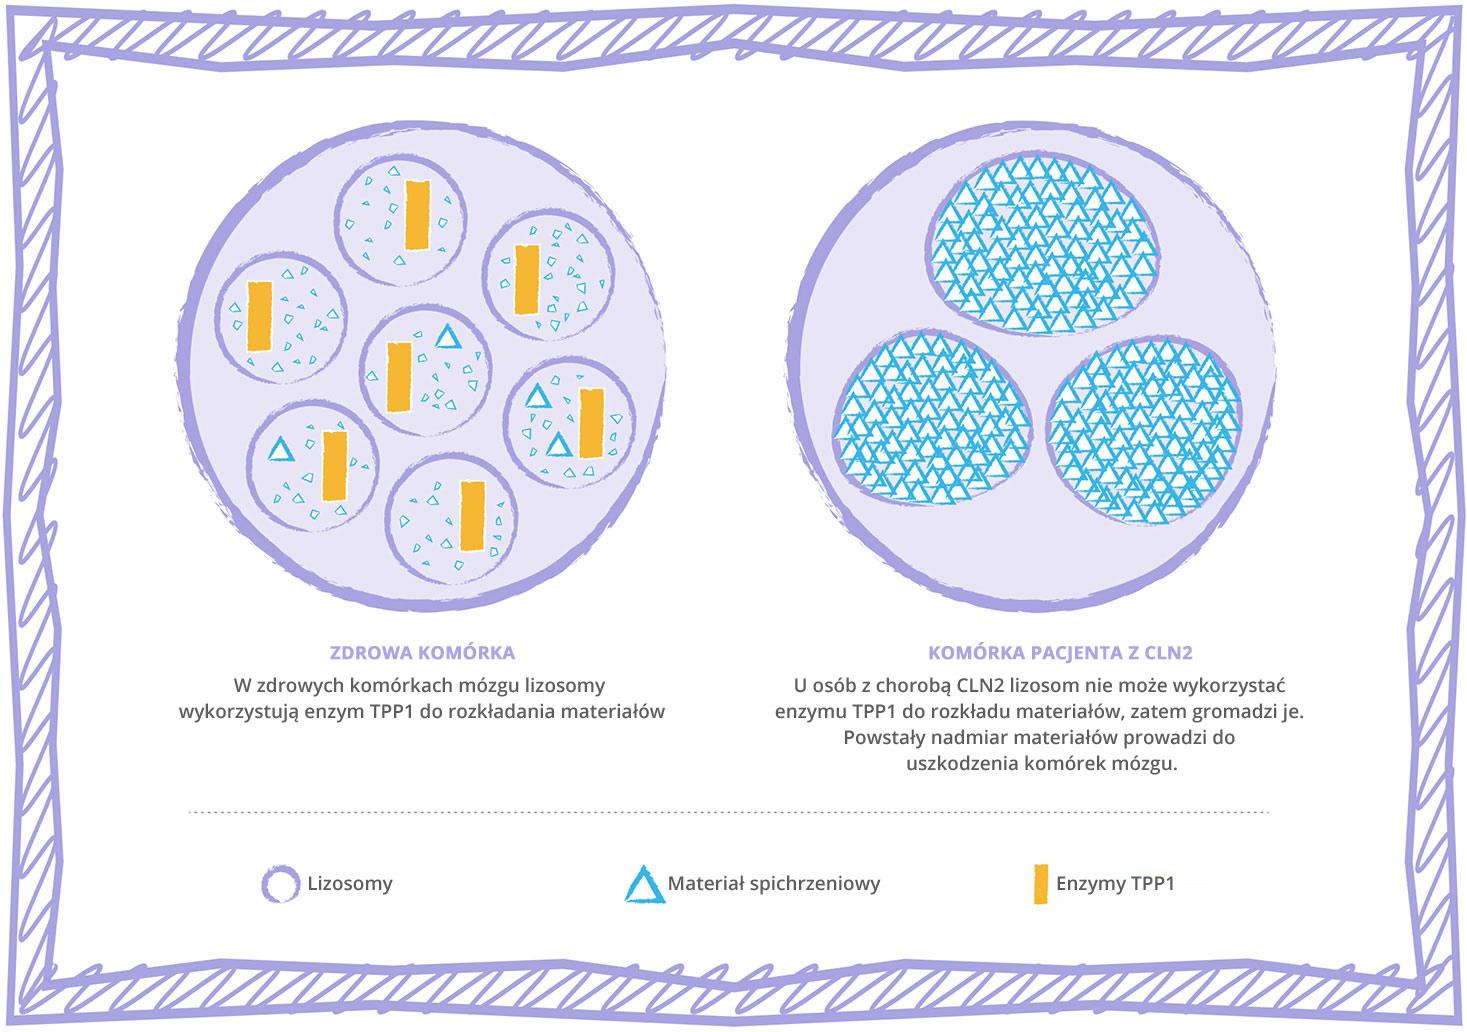 CLN2 disease lysosomal storage disorder cell graphic